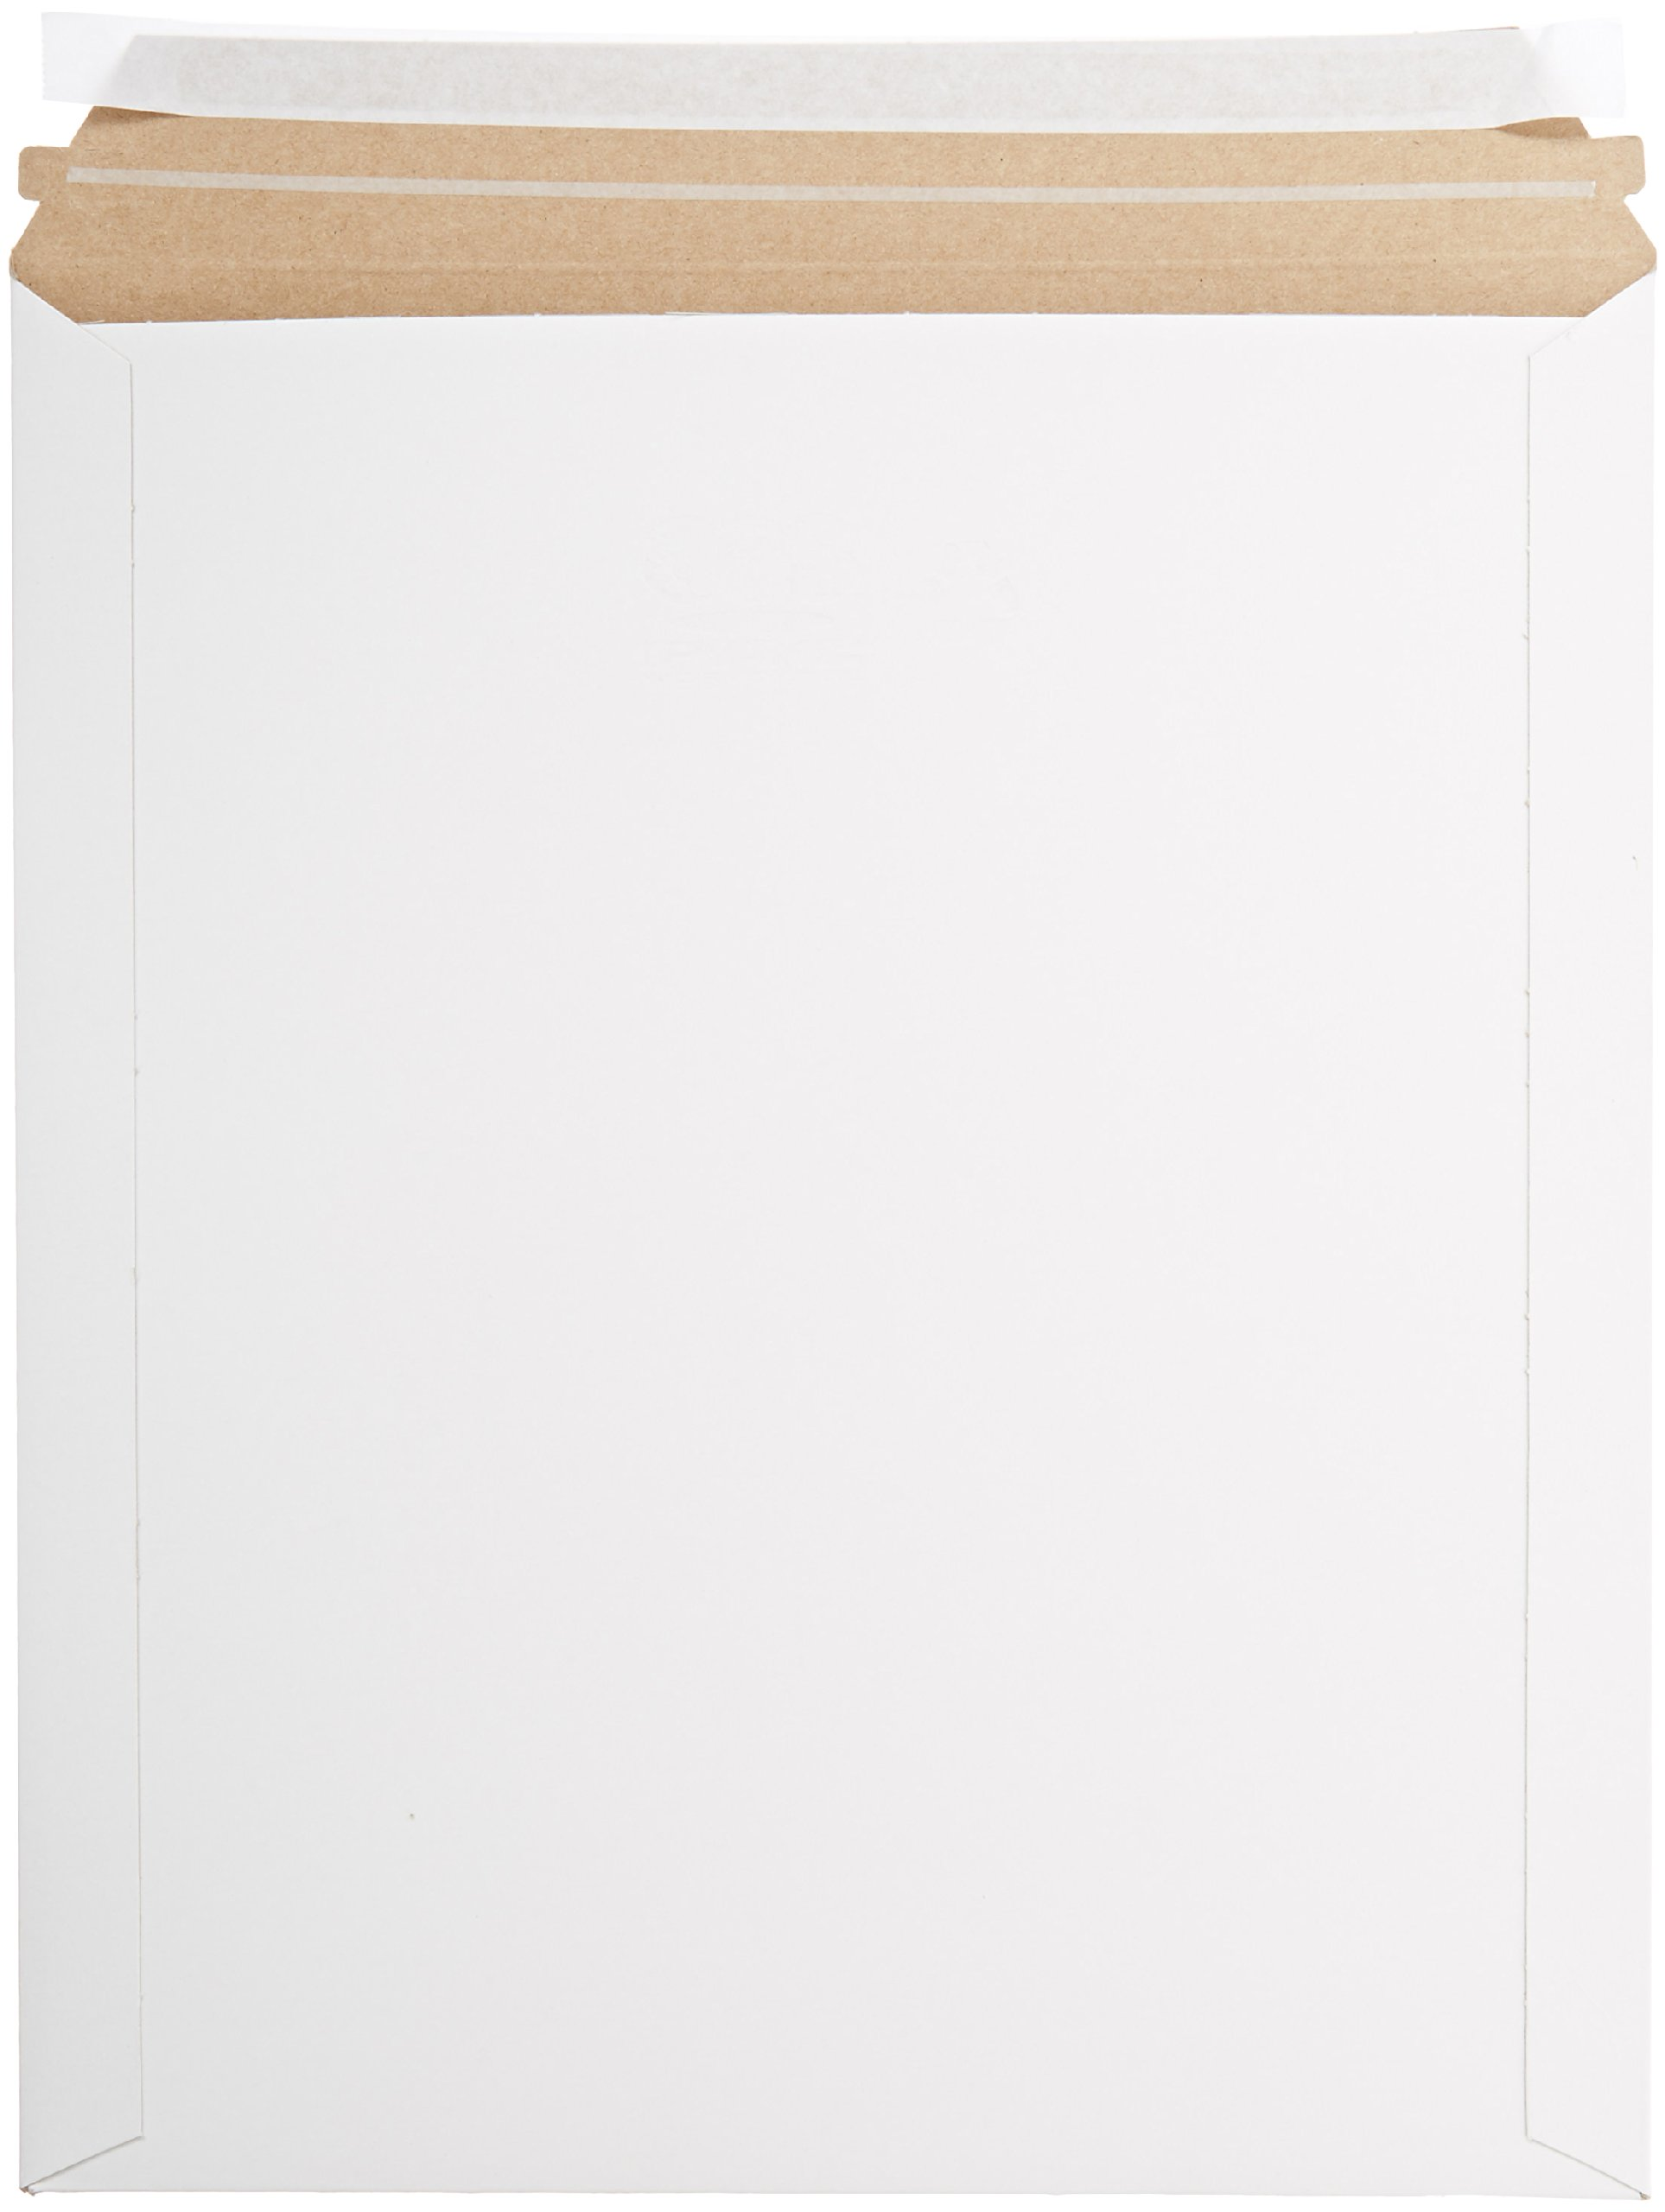 Pratt MJ-6 Self-Seal Stay Flat Mailer, White, 12.75'' x 15'' (Pack of 100)